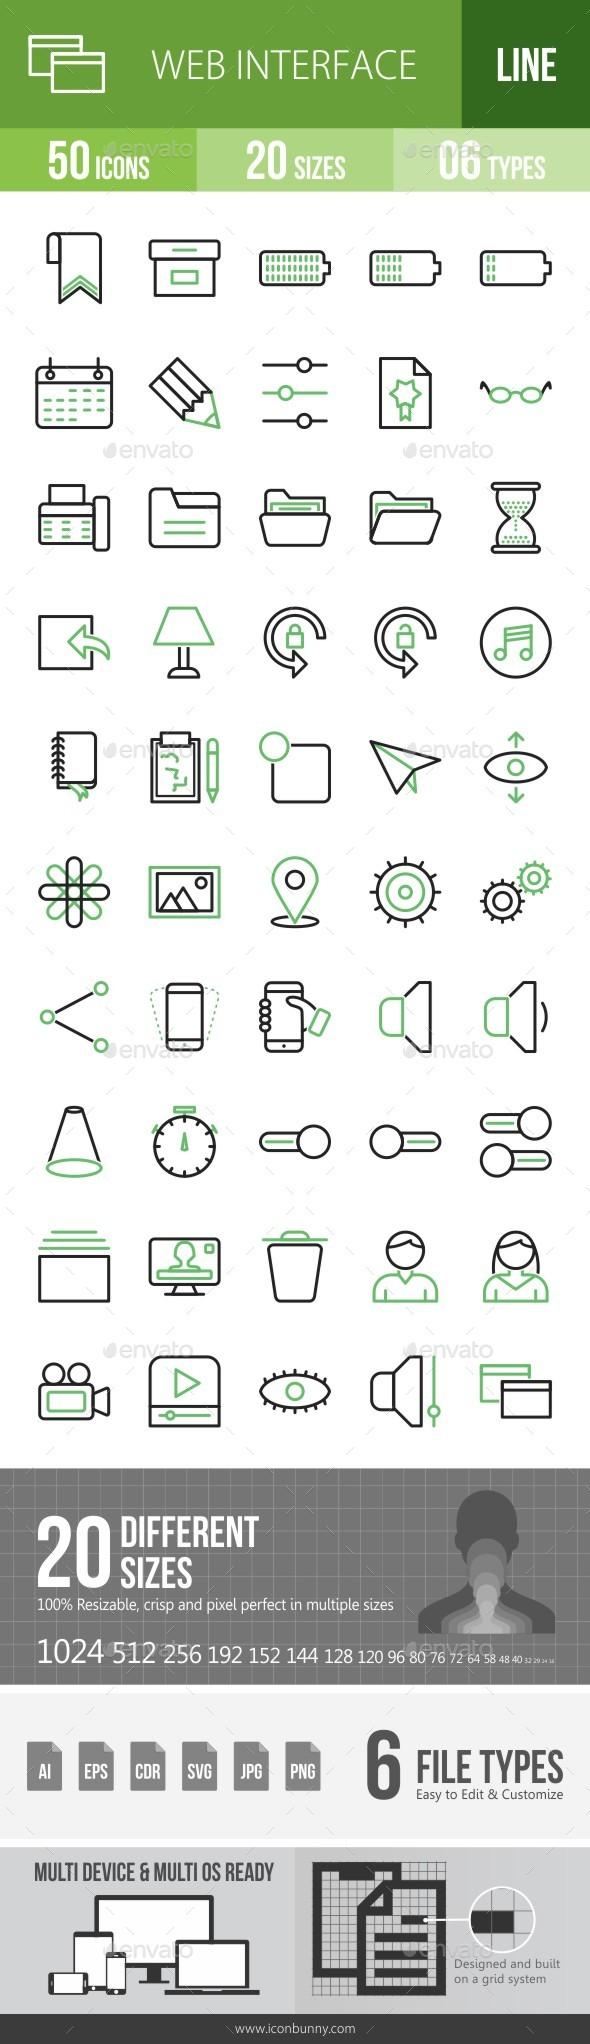 Web Interface Line Green & Black Icons